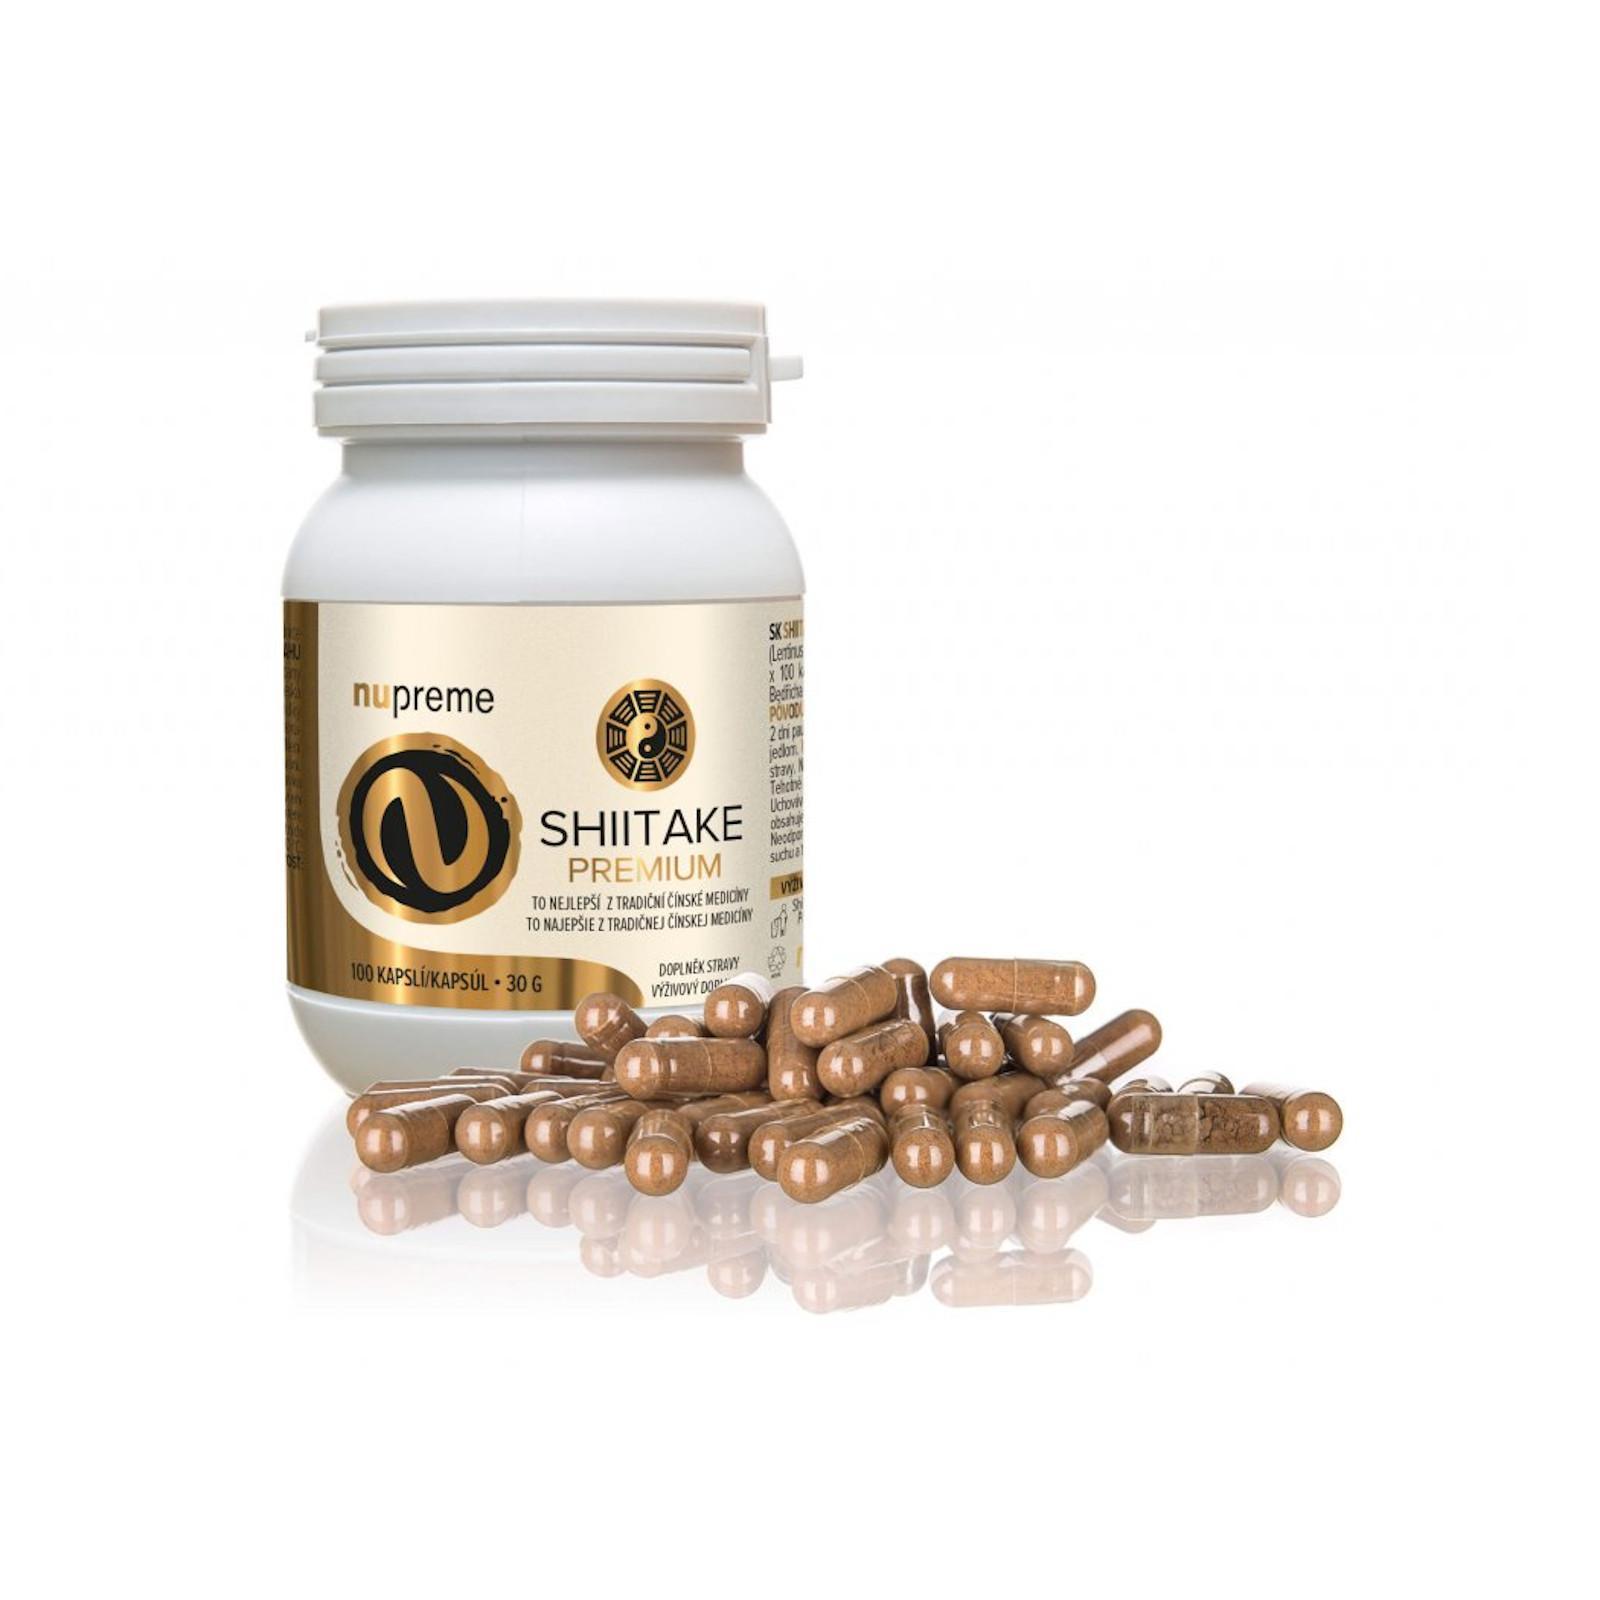 Nupreme Shiitake premium extrakt, kapsle 100 ks, 30 g